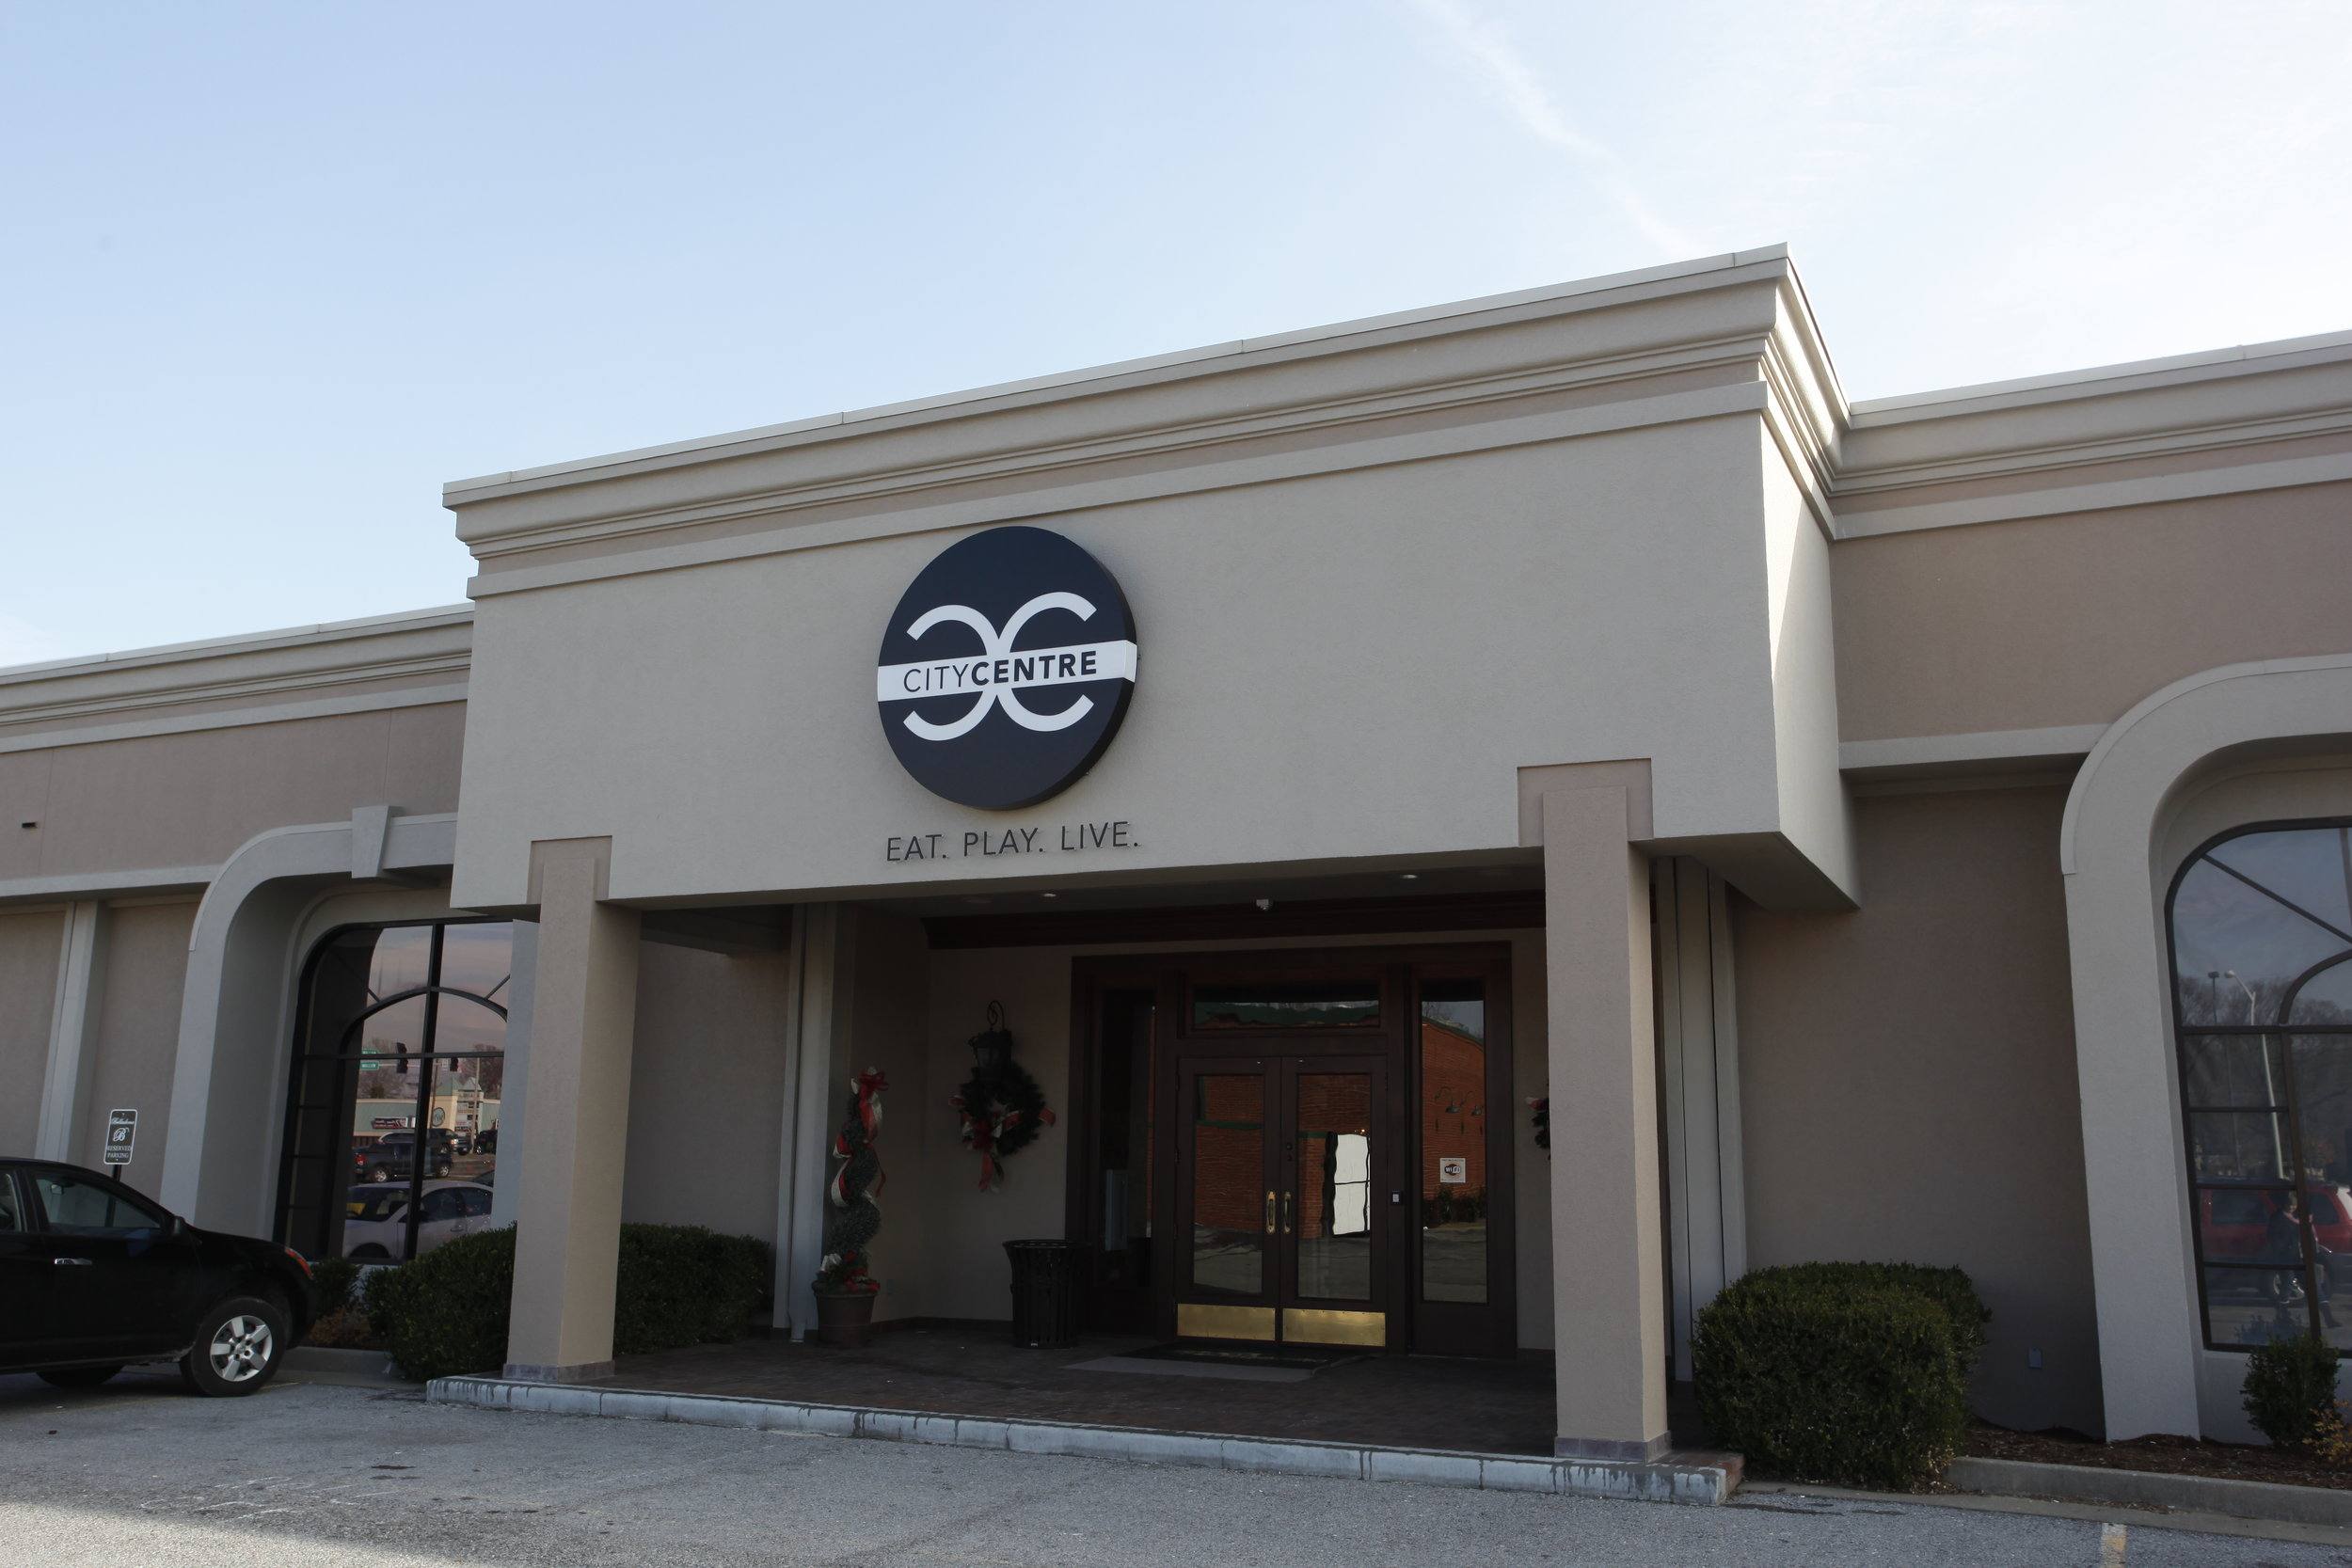 City Centre - Cape Girardeau, Missouri